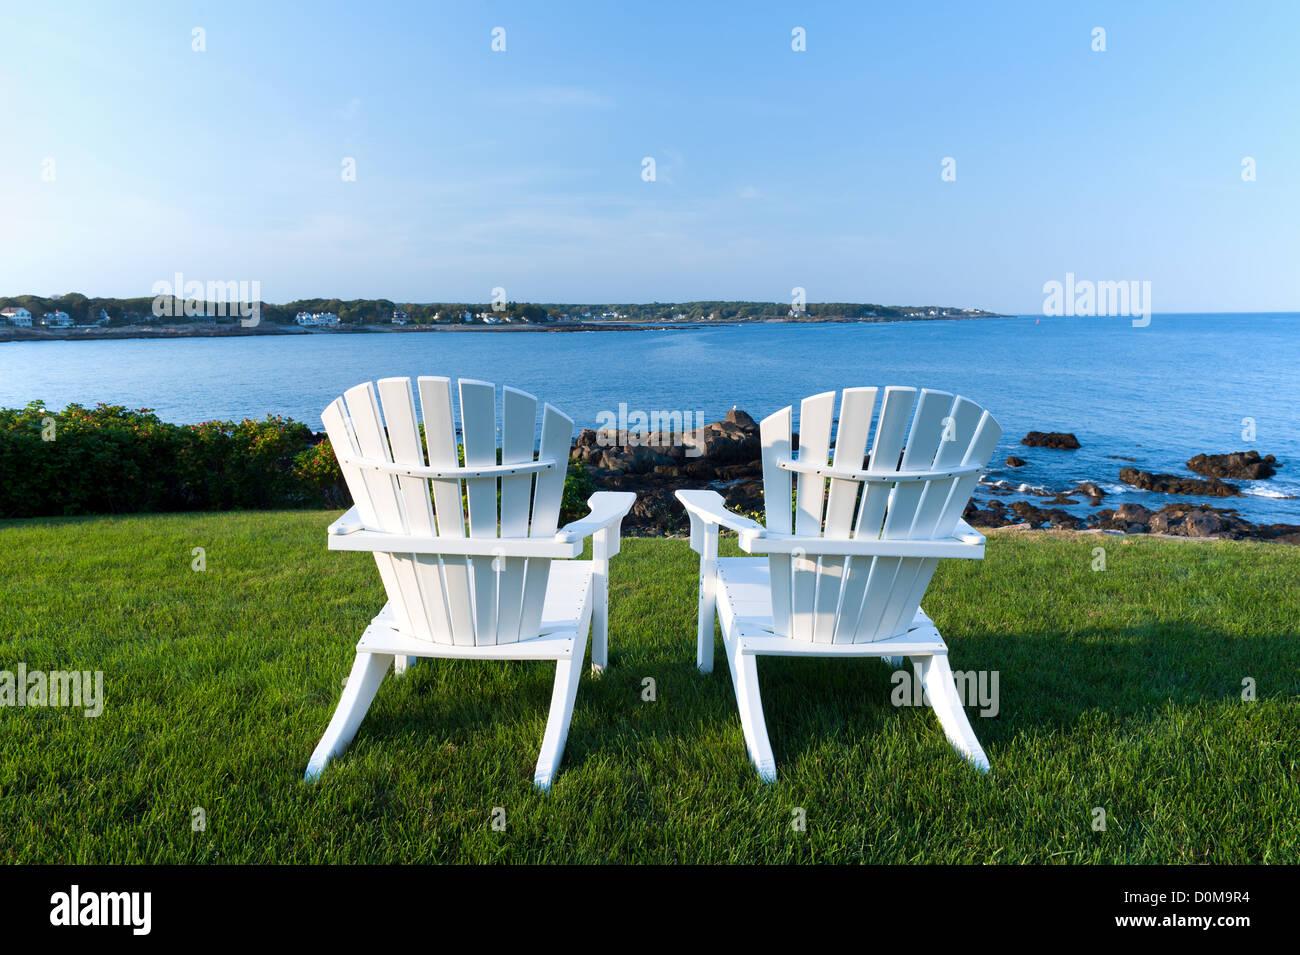 Mesmerizing 70 Adirondack Chairs On Beach Design Inspiration Of